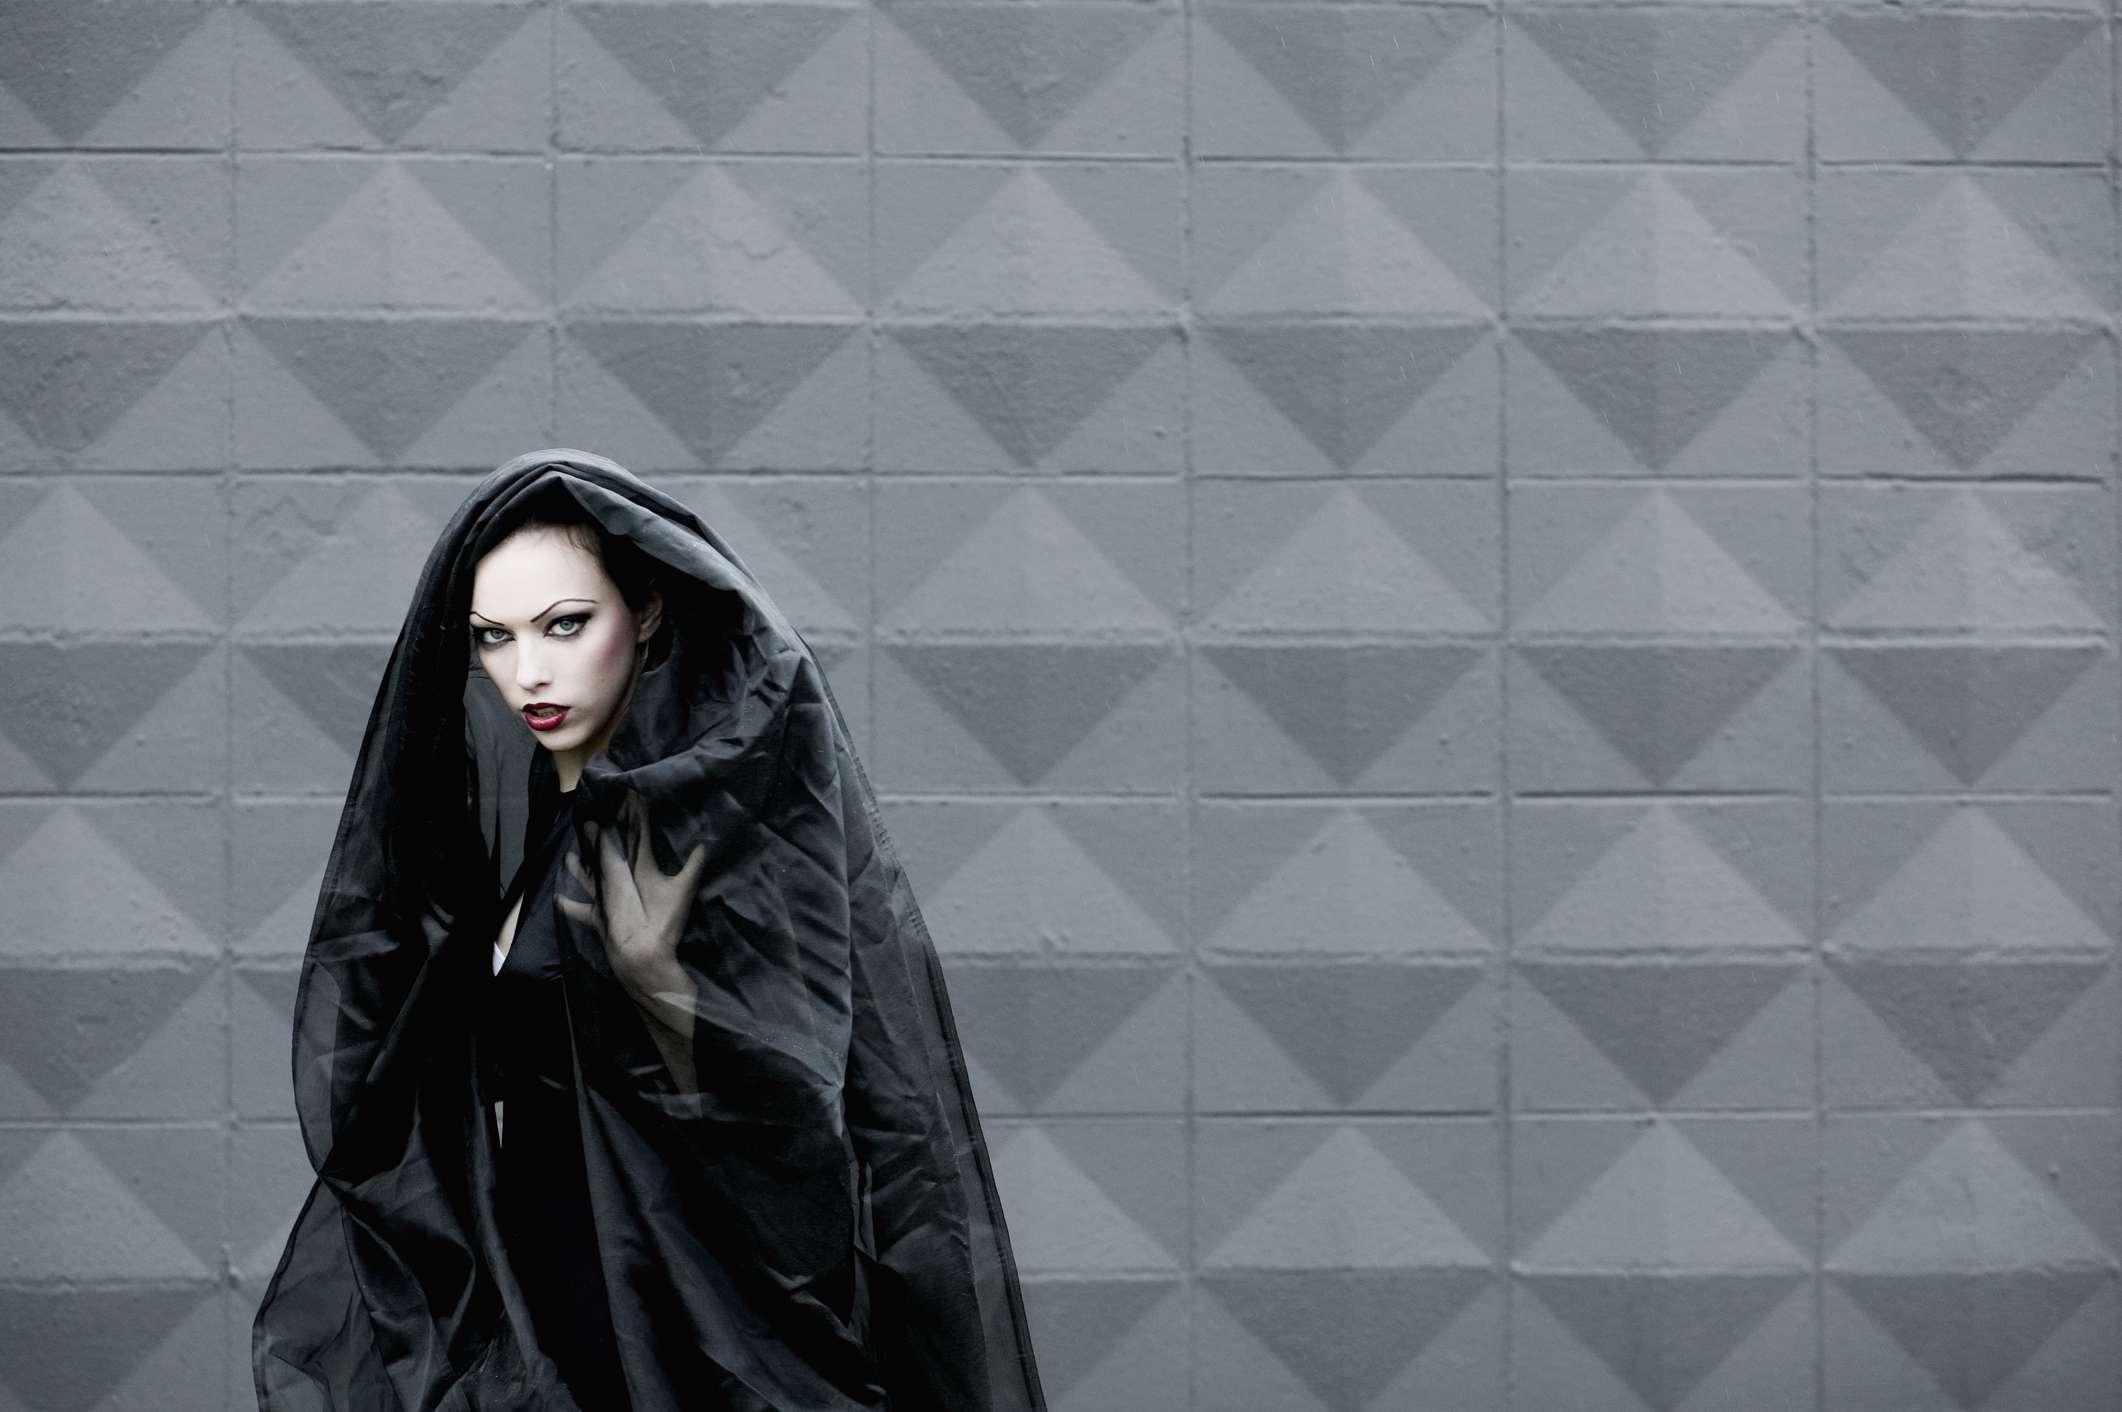 Seductive woman in black cloak